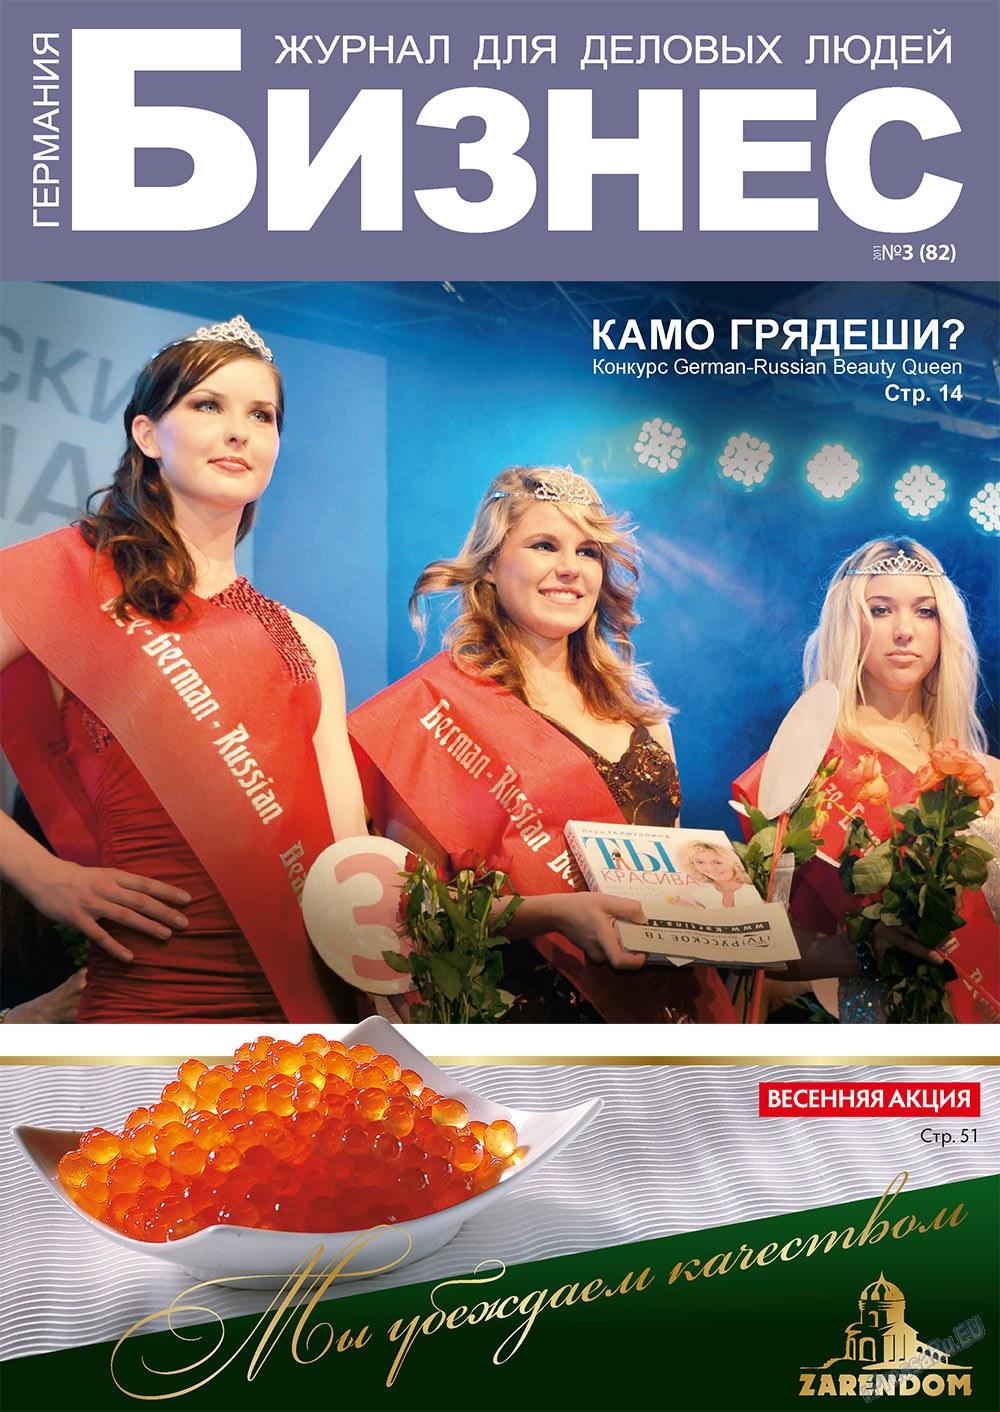 Бизнес (журнал). 2011 год, номер 3, стр. 1